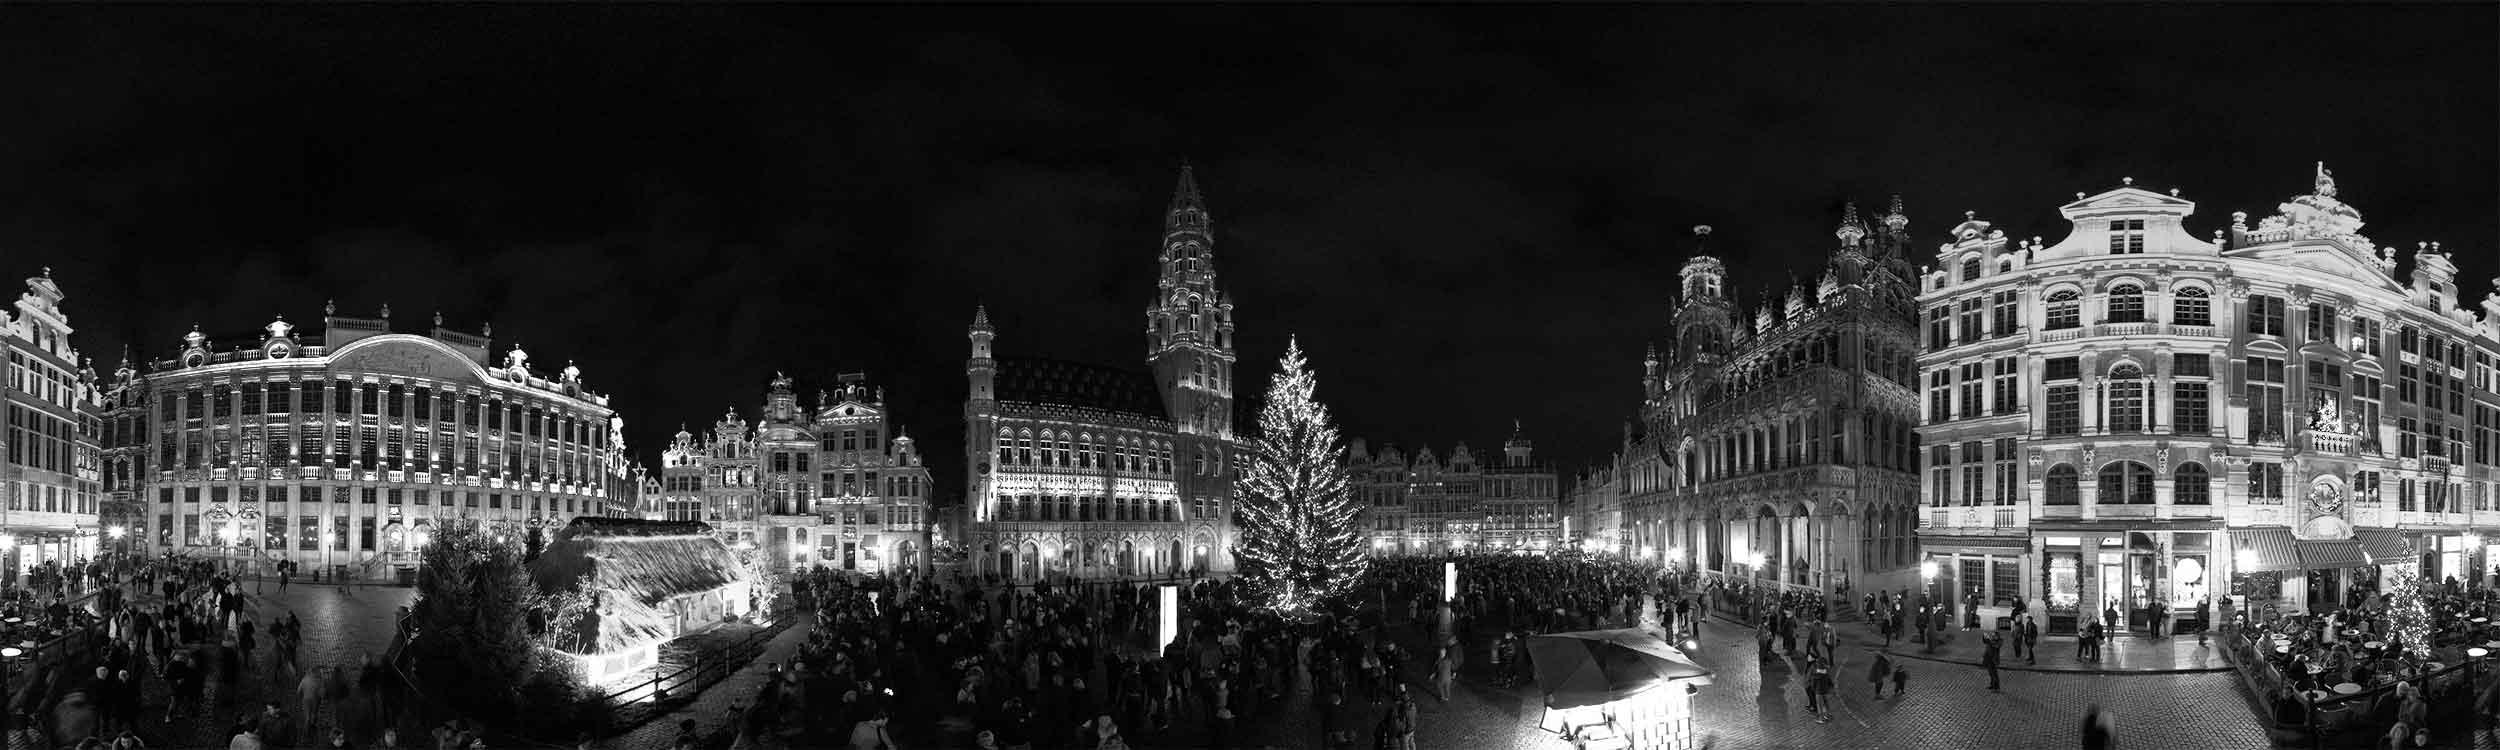 Grand place Bruxelles visite virtuelle nouvel an 360 black and white